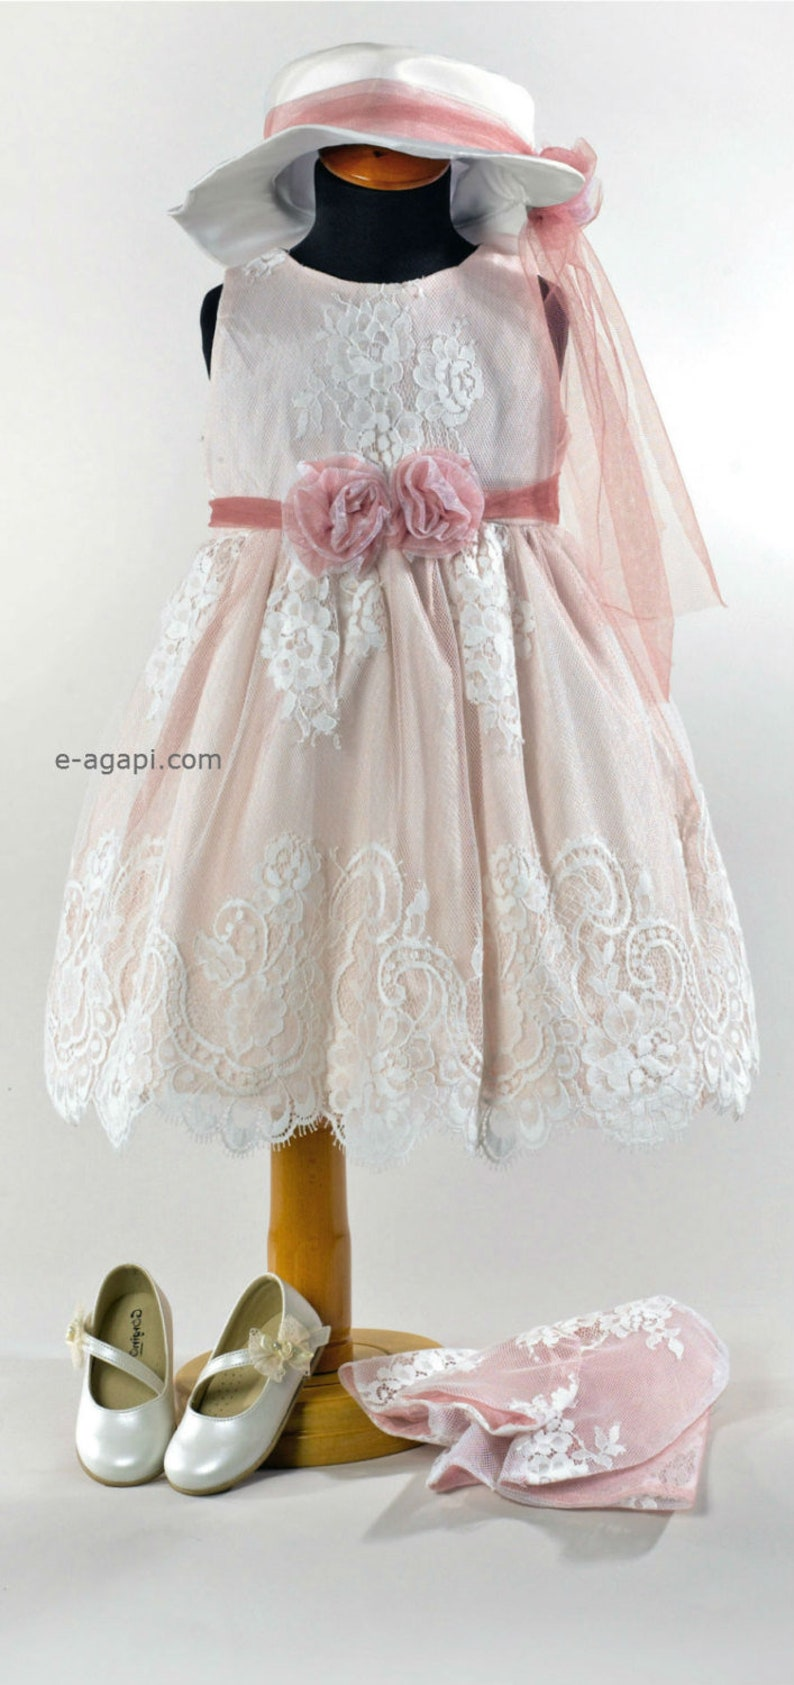 0955109a4bb57 Vintage baby girl baptism dress * Christening outfit * Party lace dress *  Infant dress set * Wedding flower girl dress hat bolero shoes opt